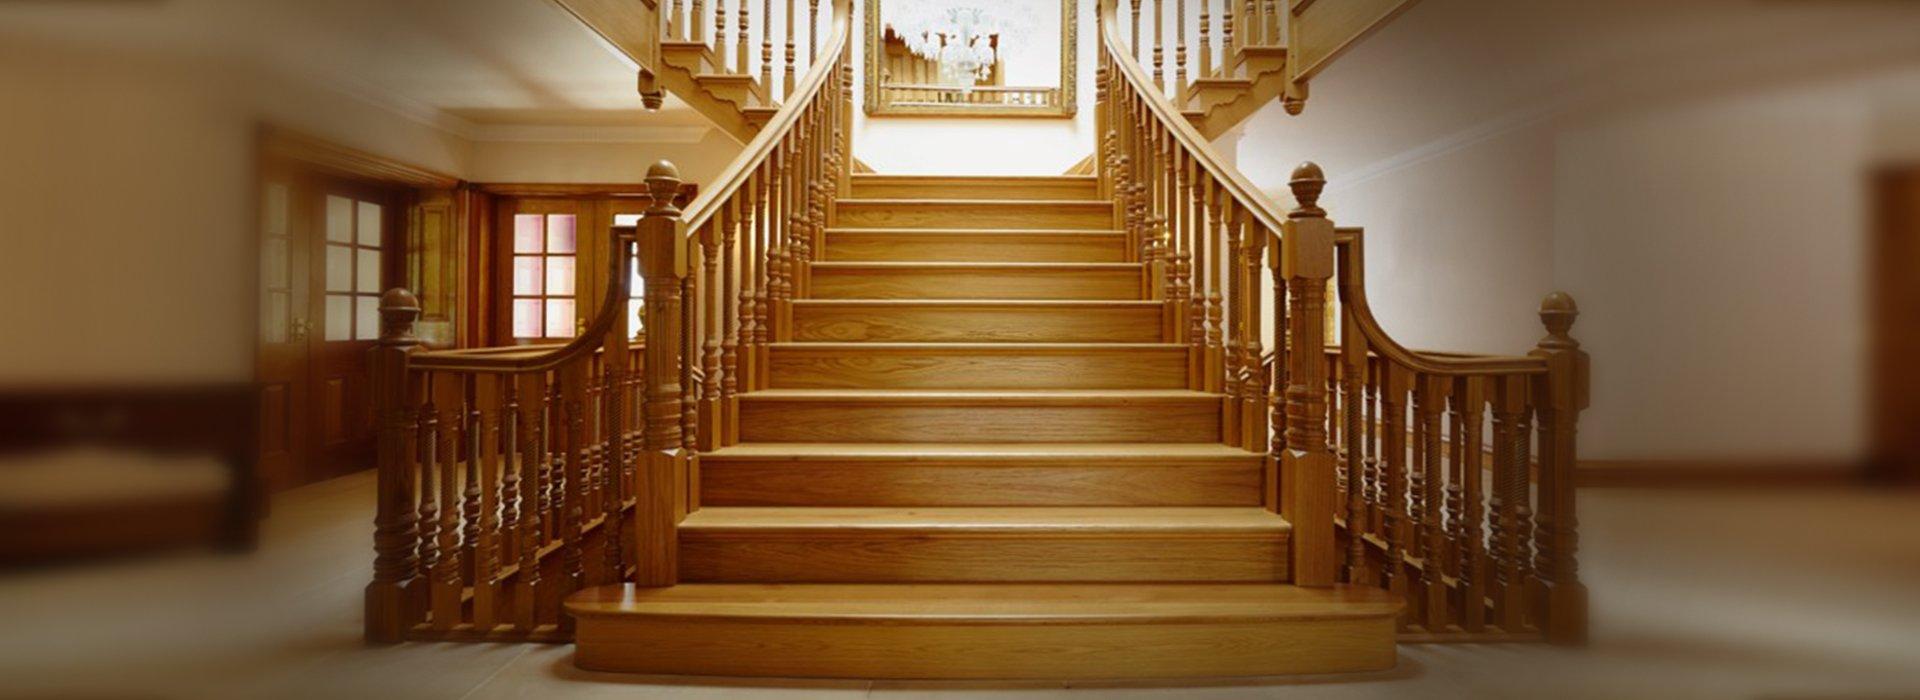 designer stairs